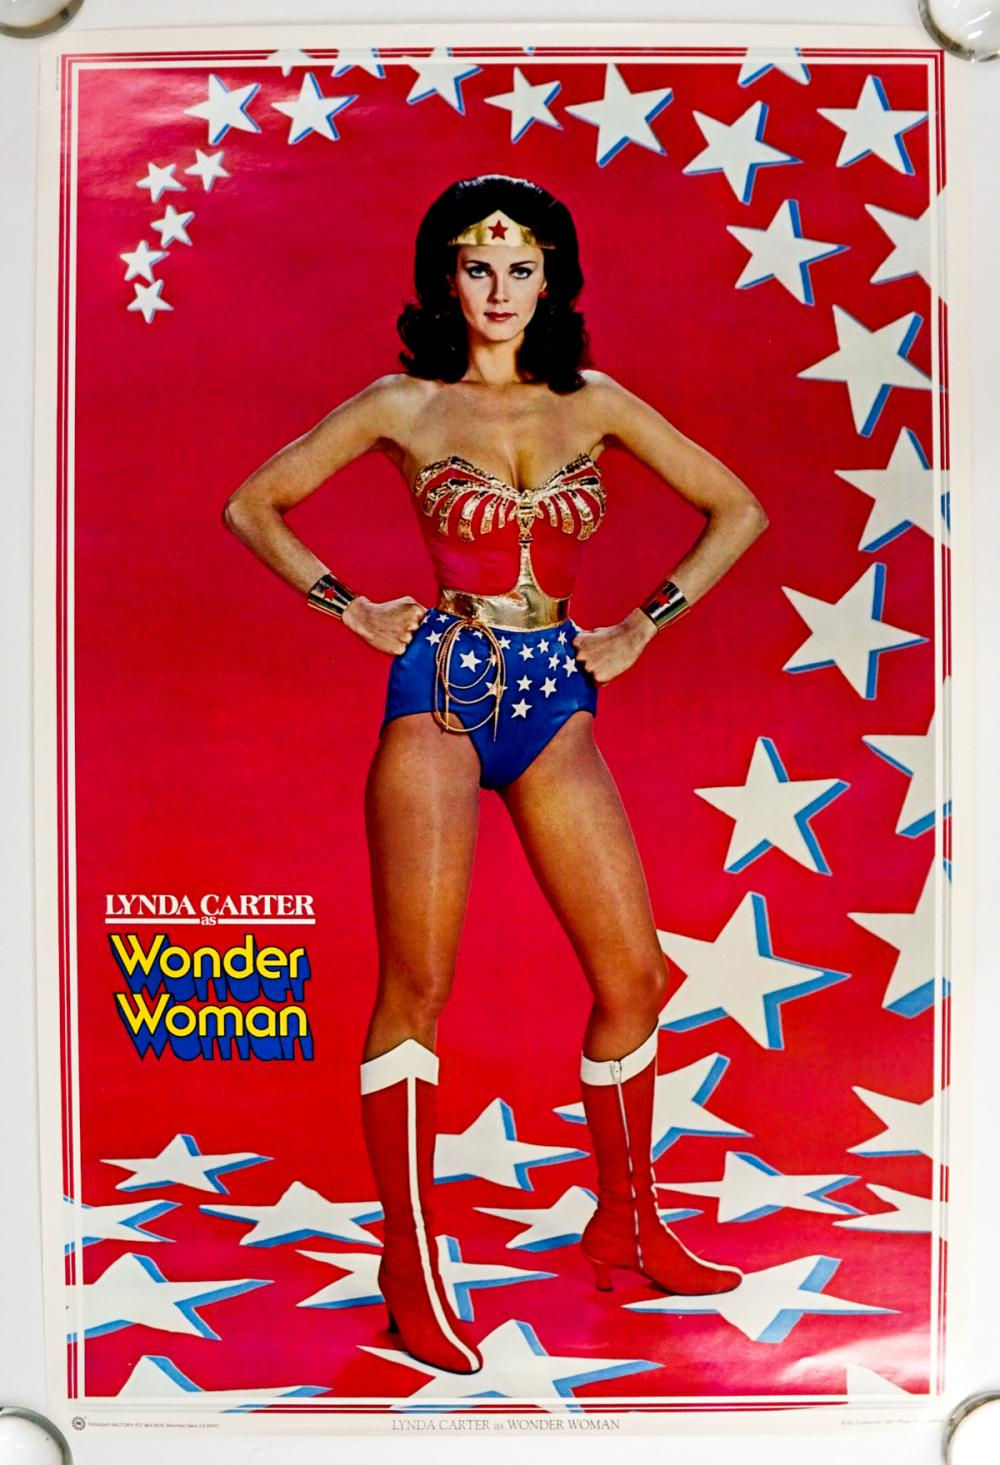 1977 Lynda Carter as Wonder Woman Poster